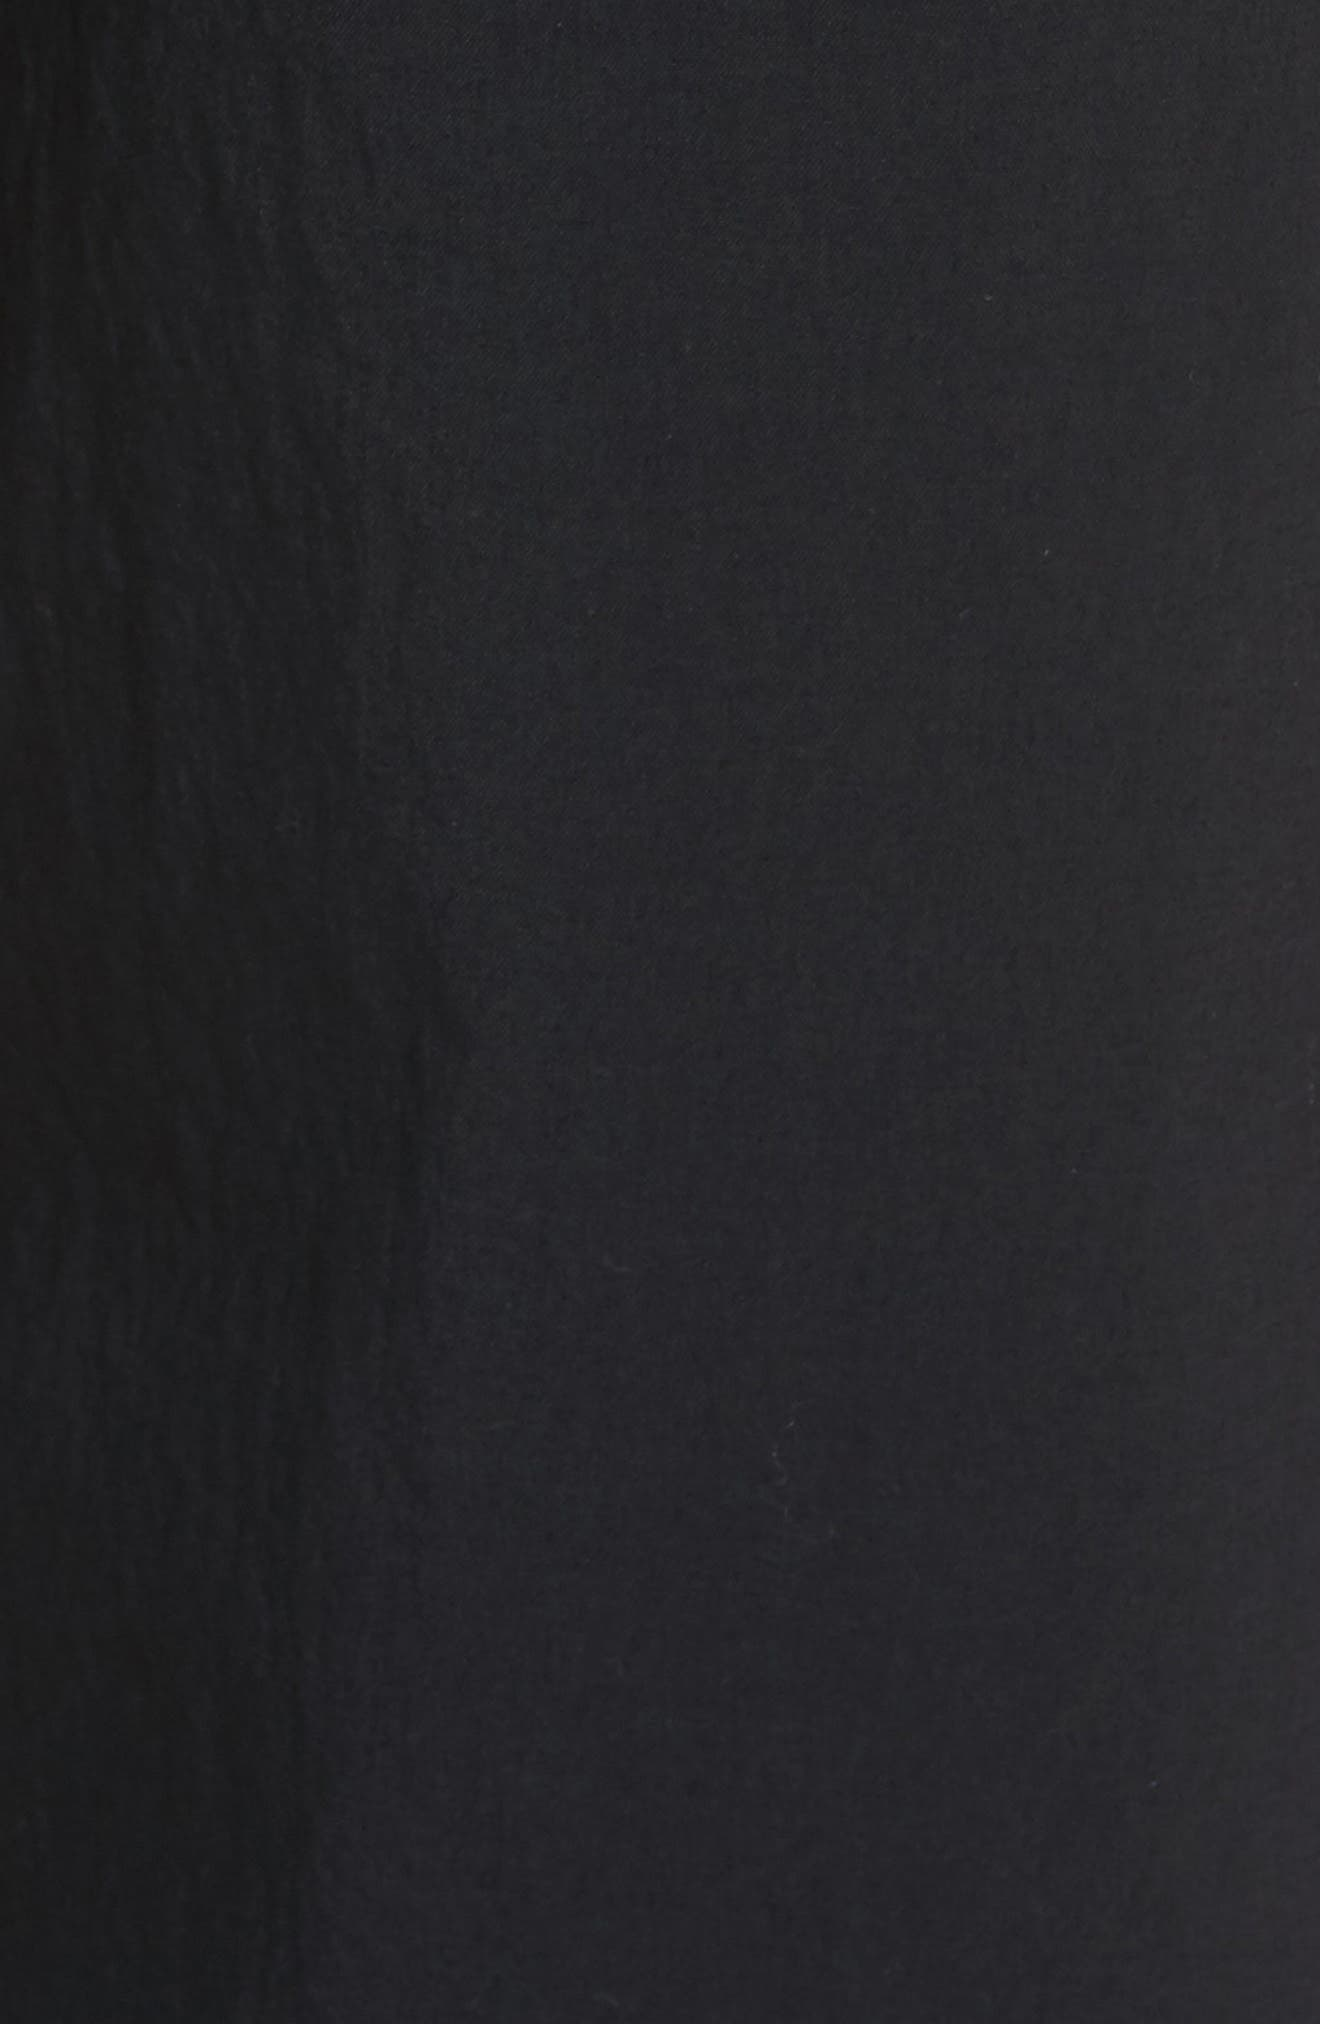 Flex Woven Pants,                             Alternate thumbnail 5, color,                             Black/ White